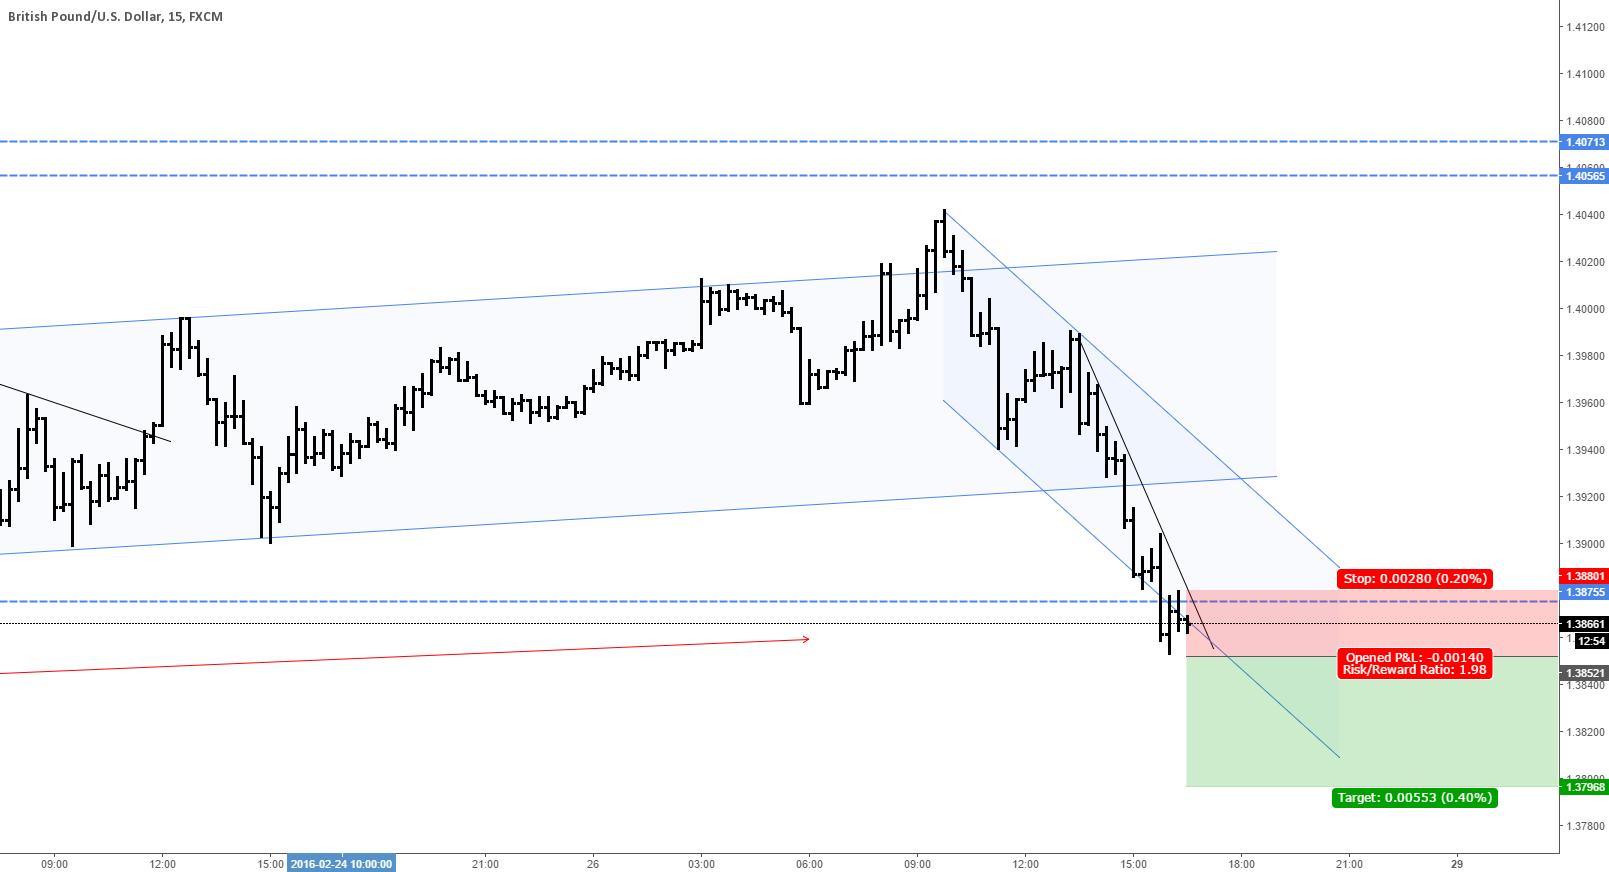 GBP/USD Trade26/02